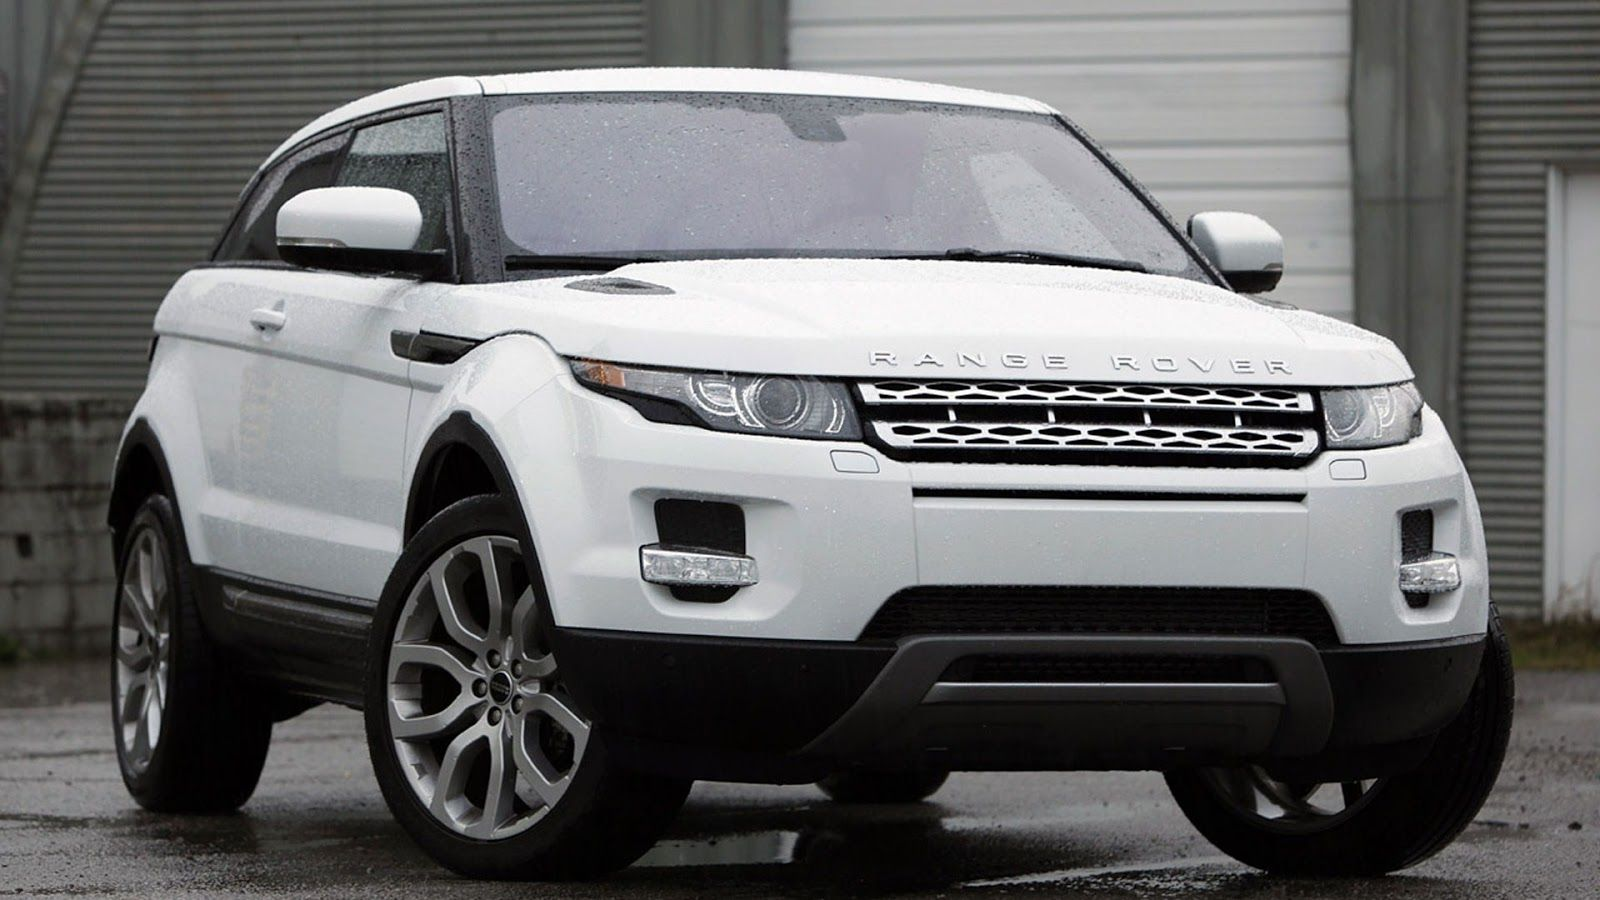 Car Wallpaper For 2017 Range Rover Evoque Sport Design